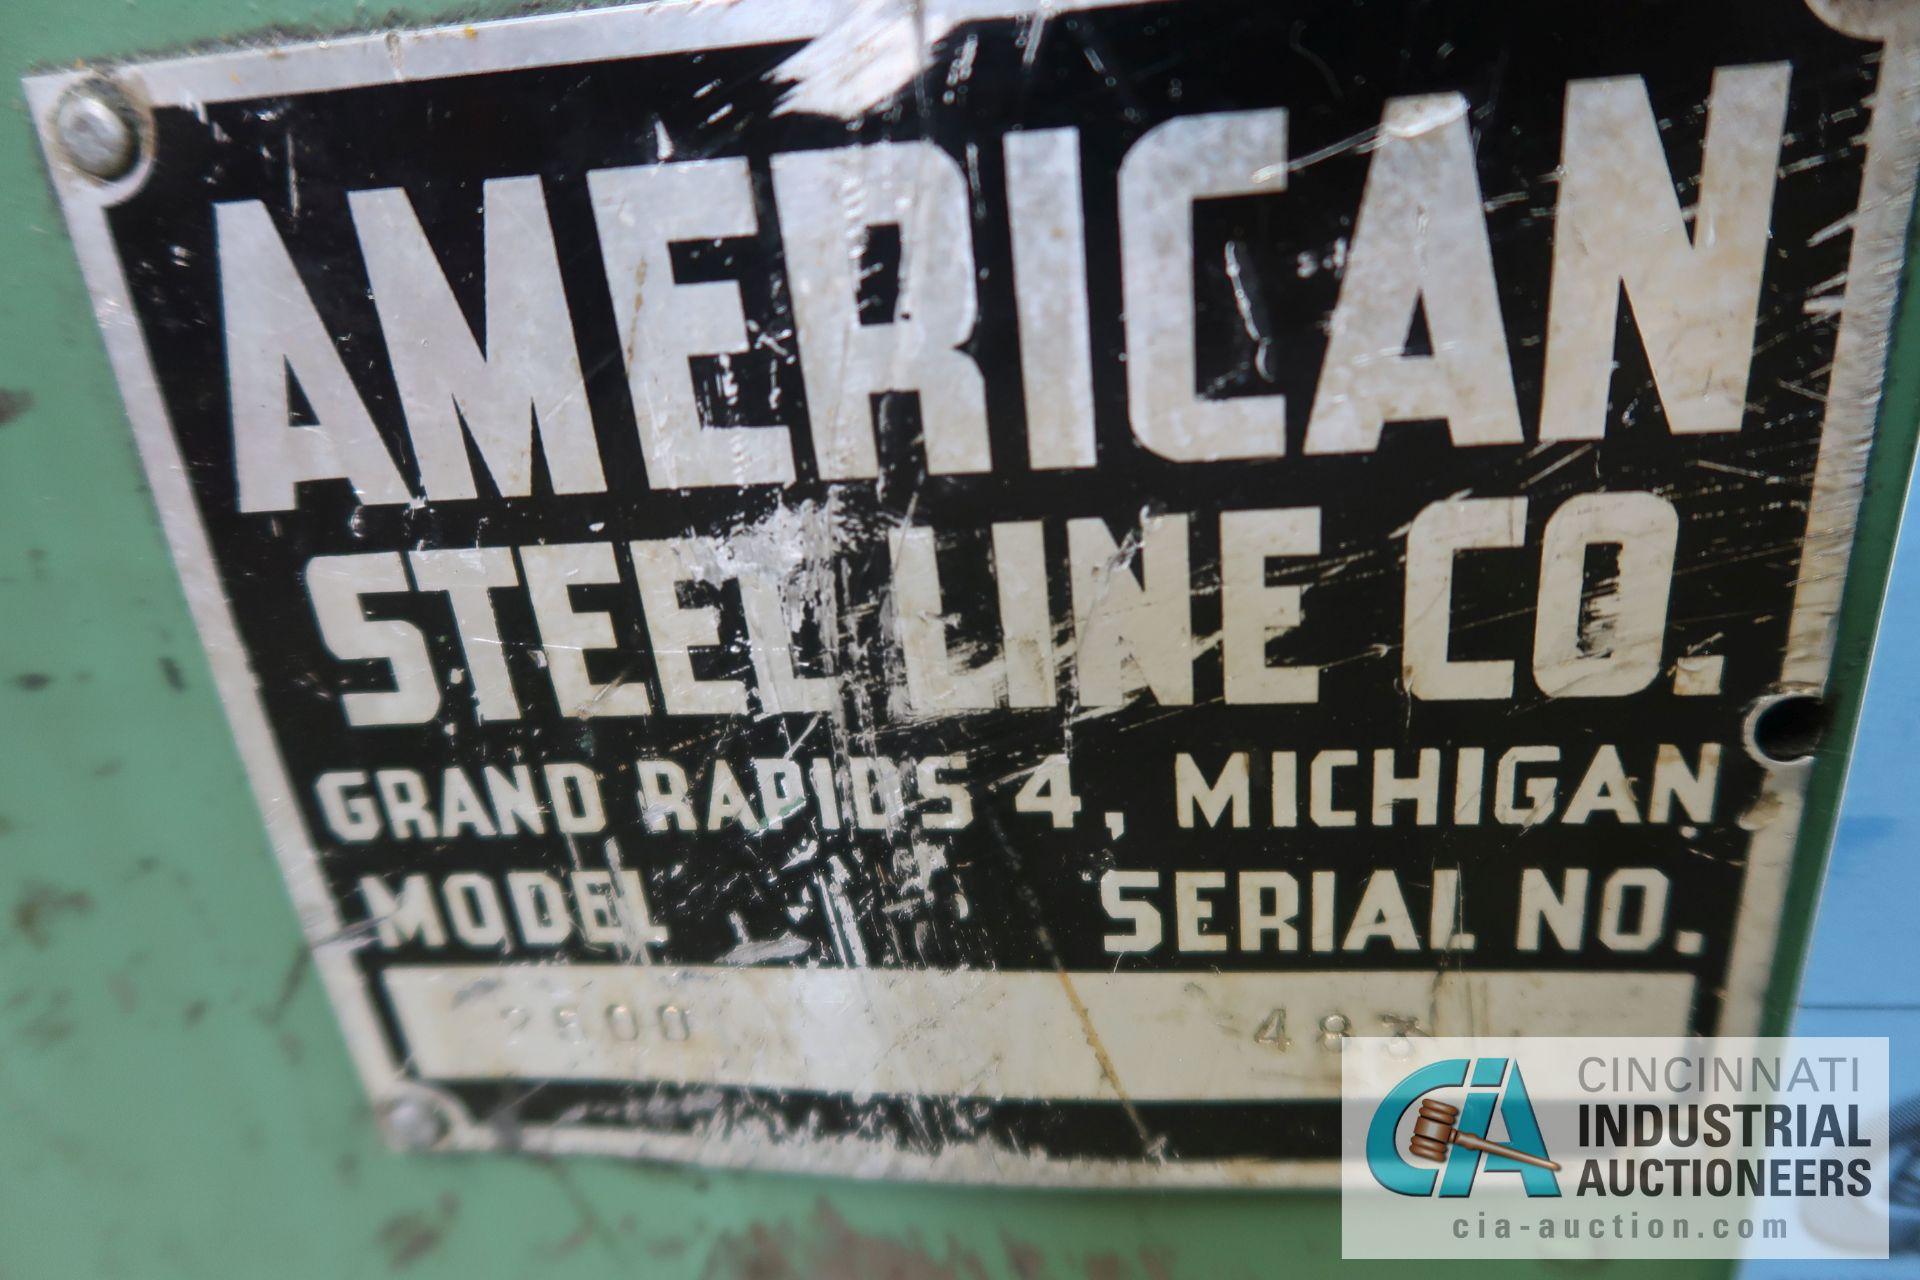 2,500 LB. CAPACITY AMERICAN STEEL LINE MODEL 2500 AUTO CENTERING REEL; S/N 483, MACHINE #107-3 - Image 3 of 3